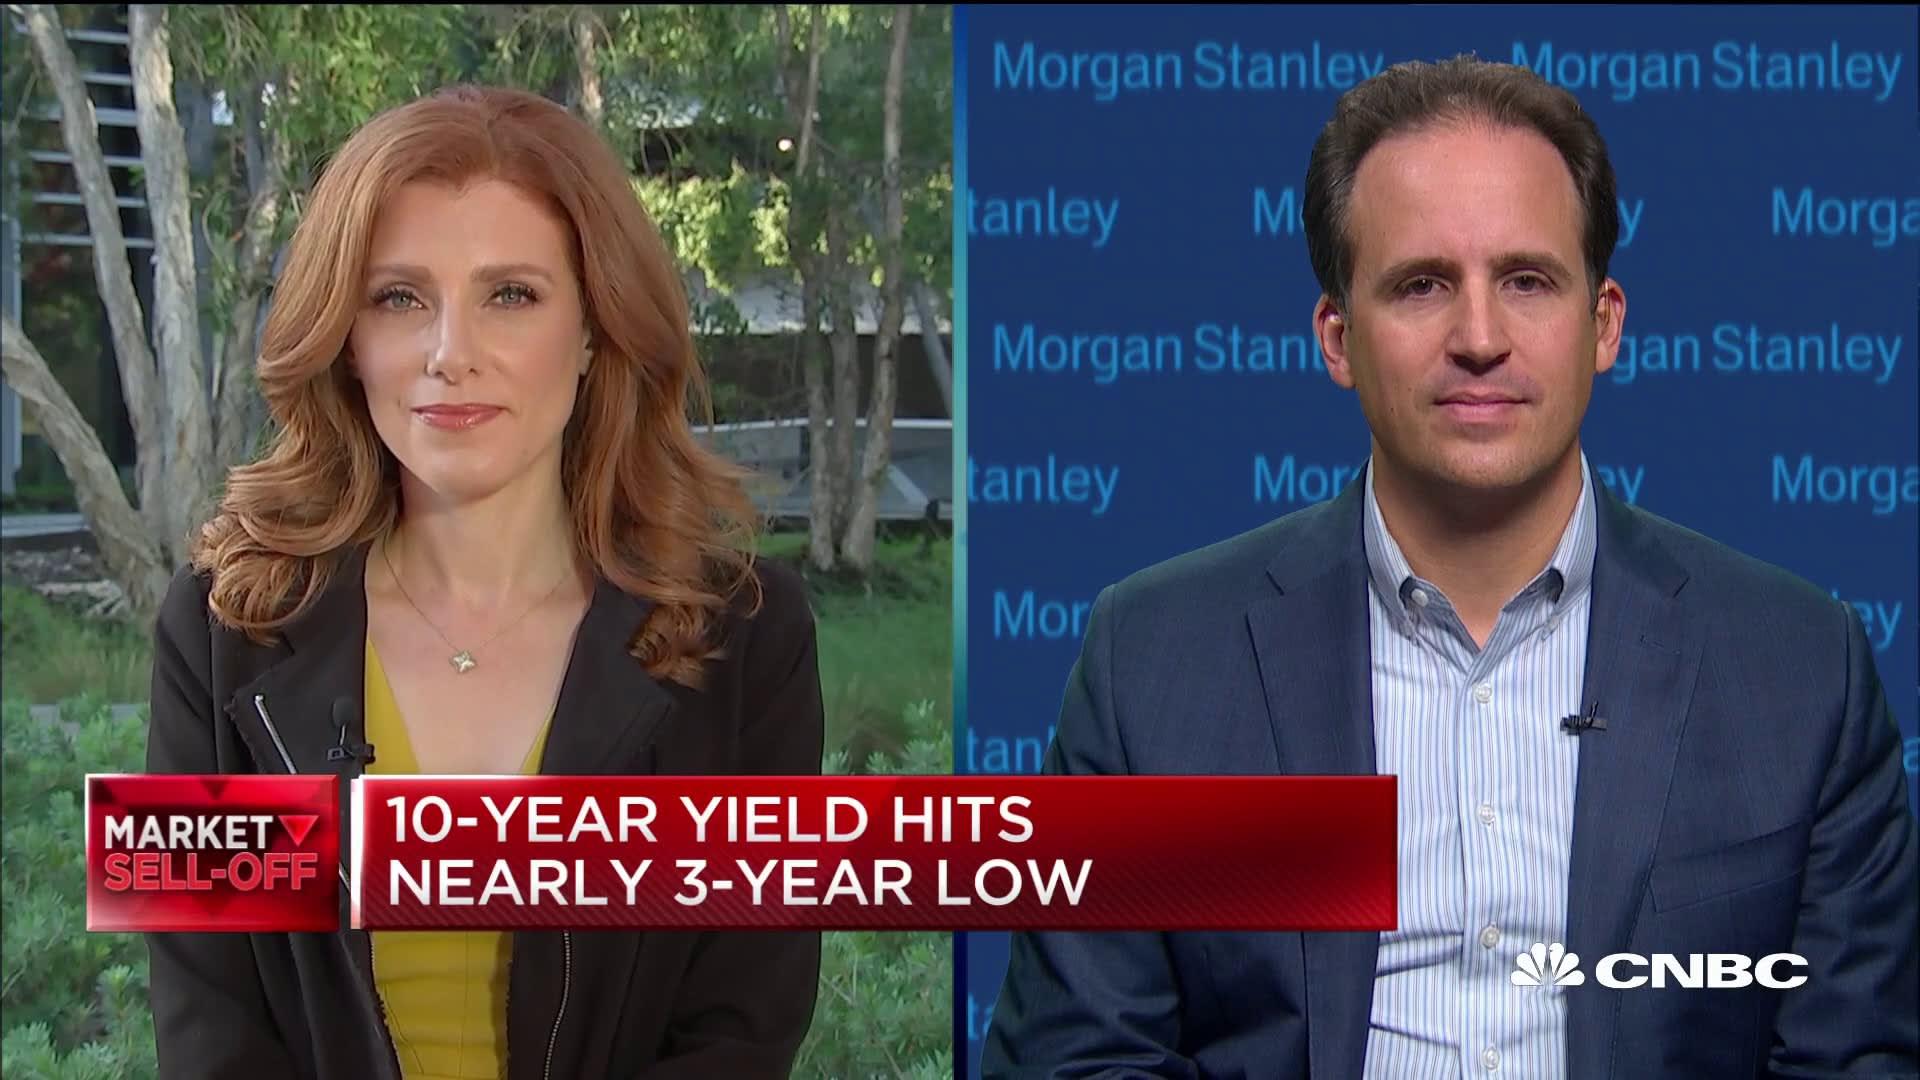 Morgan Stanley's Ben Swinburne on Disney's new streaming service